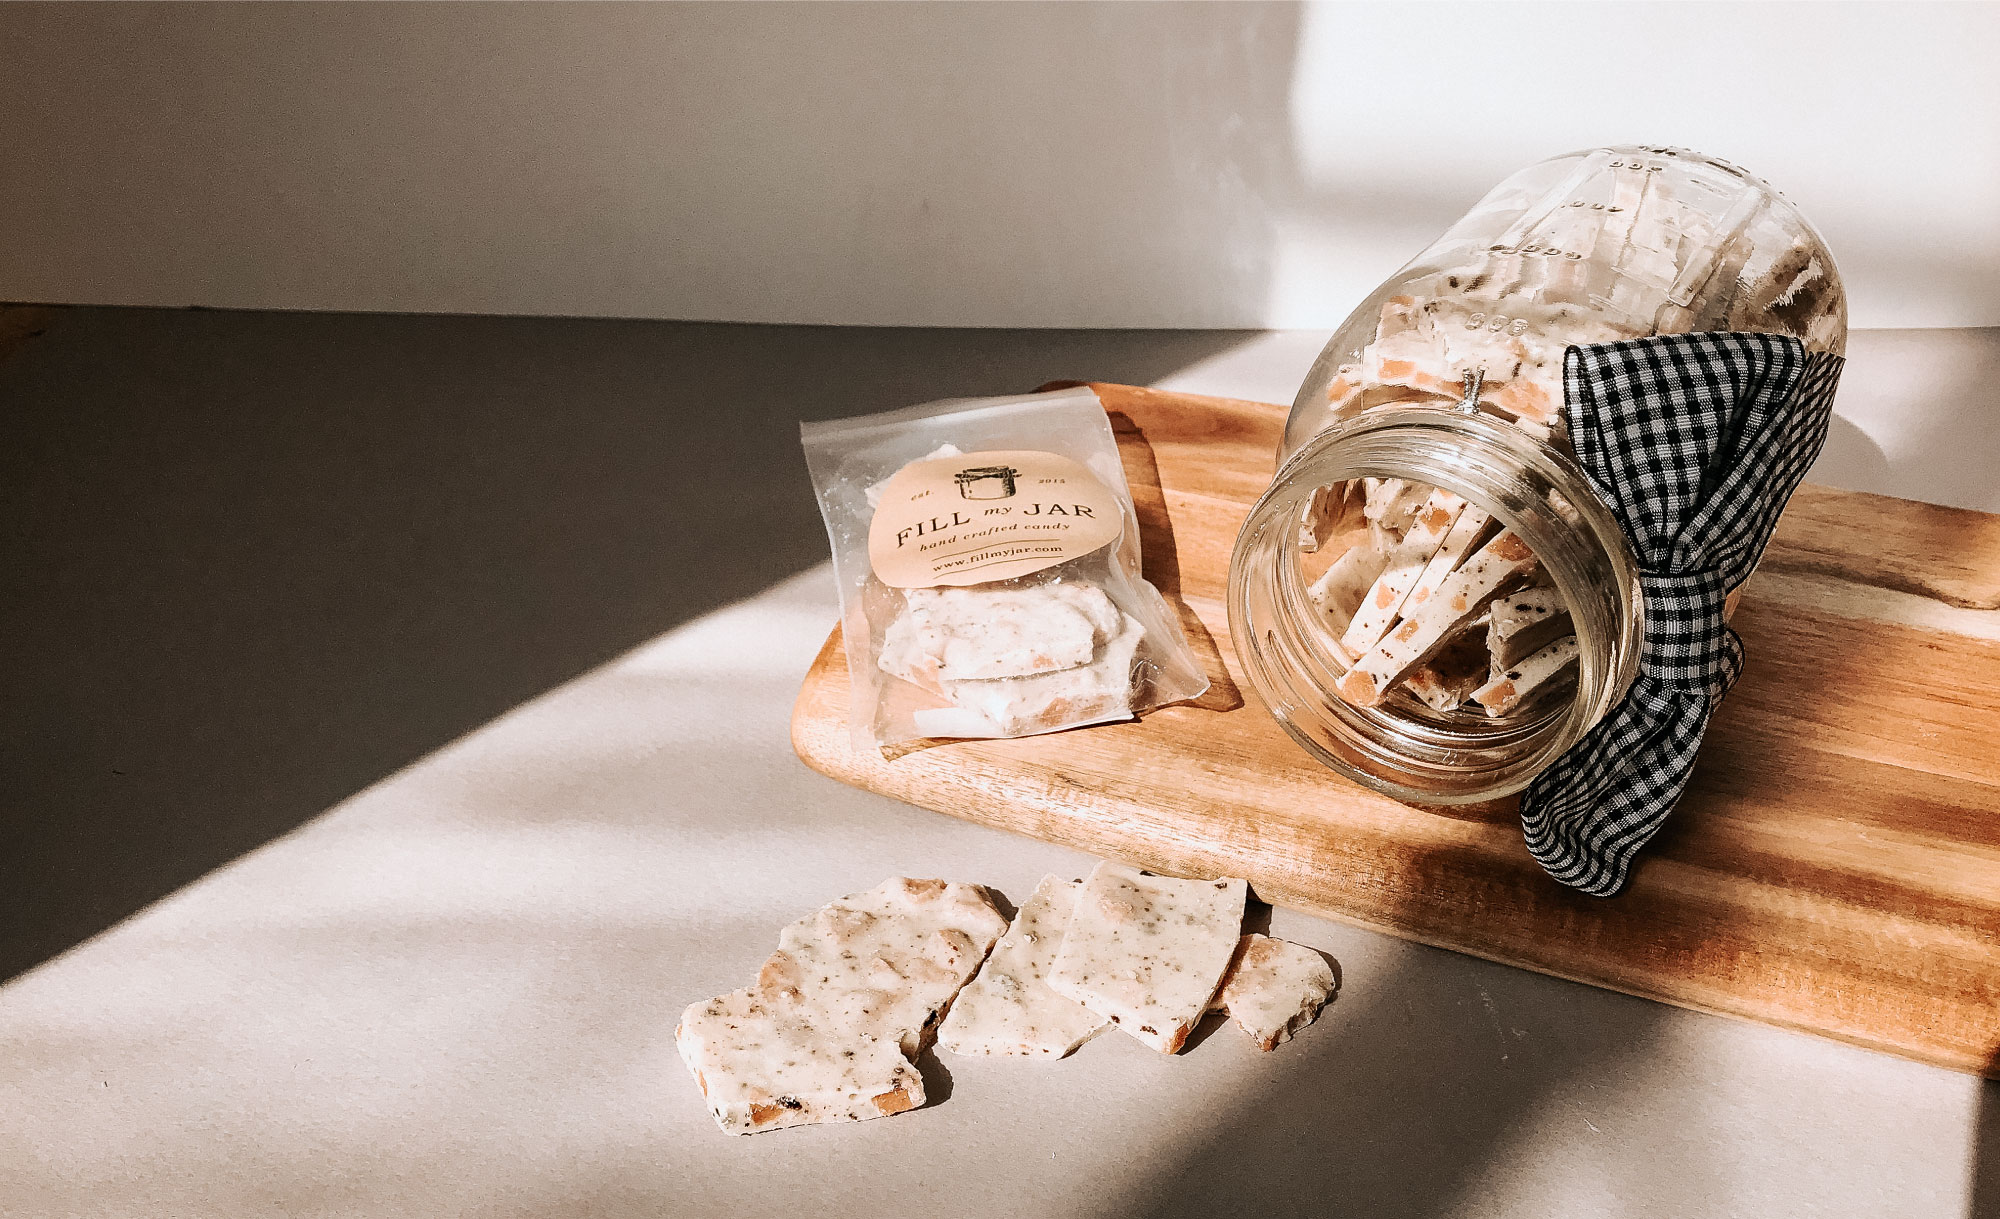 Fill My Jar Brand Design By Viola Hill Studio